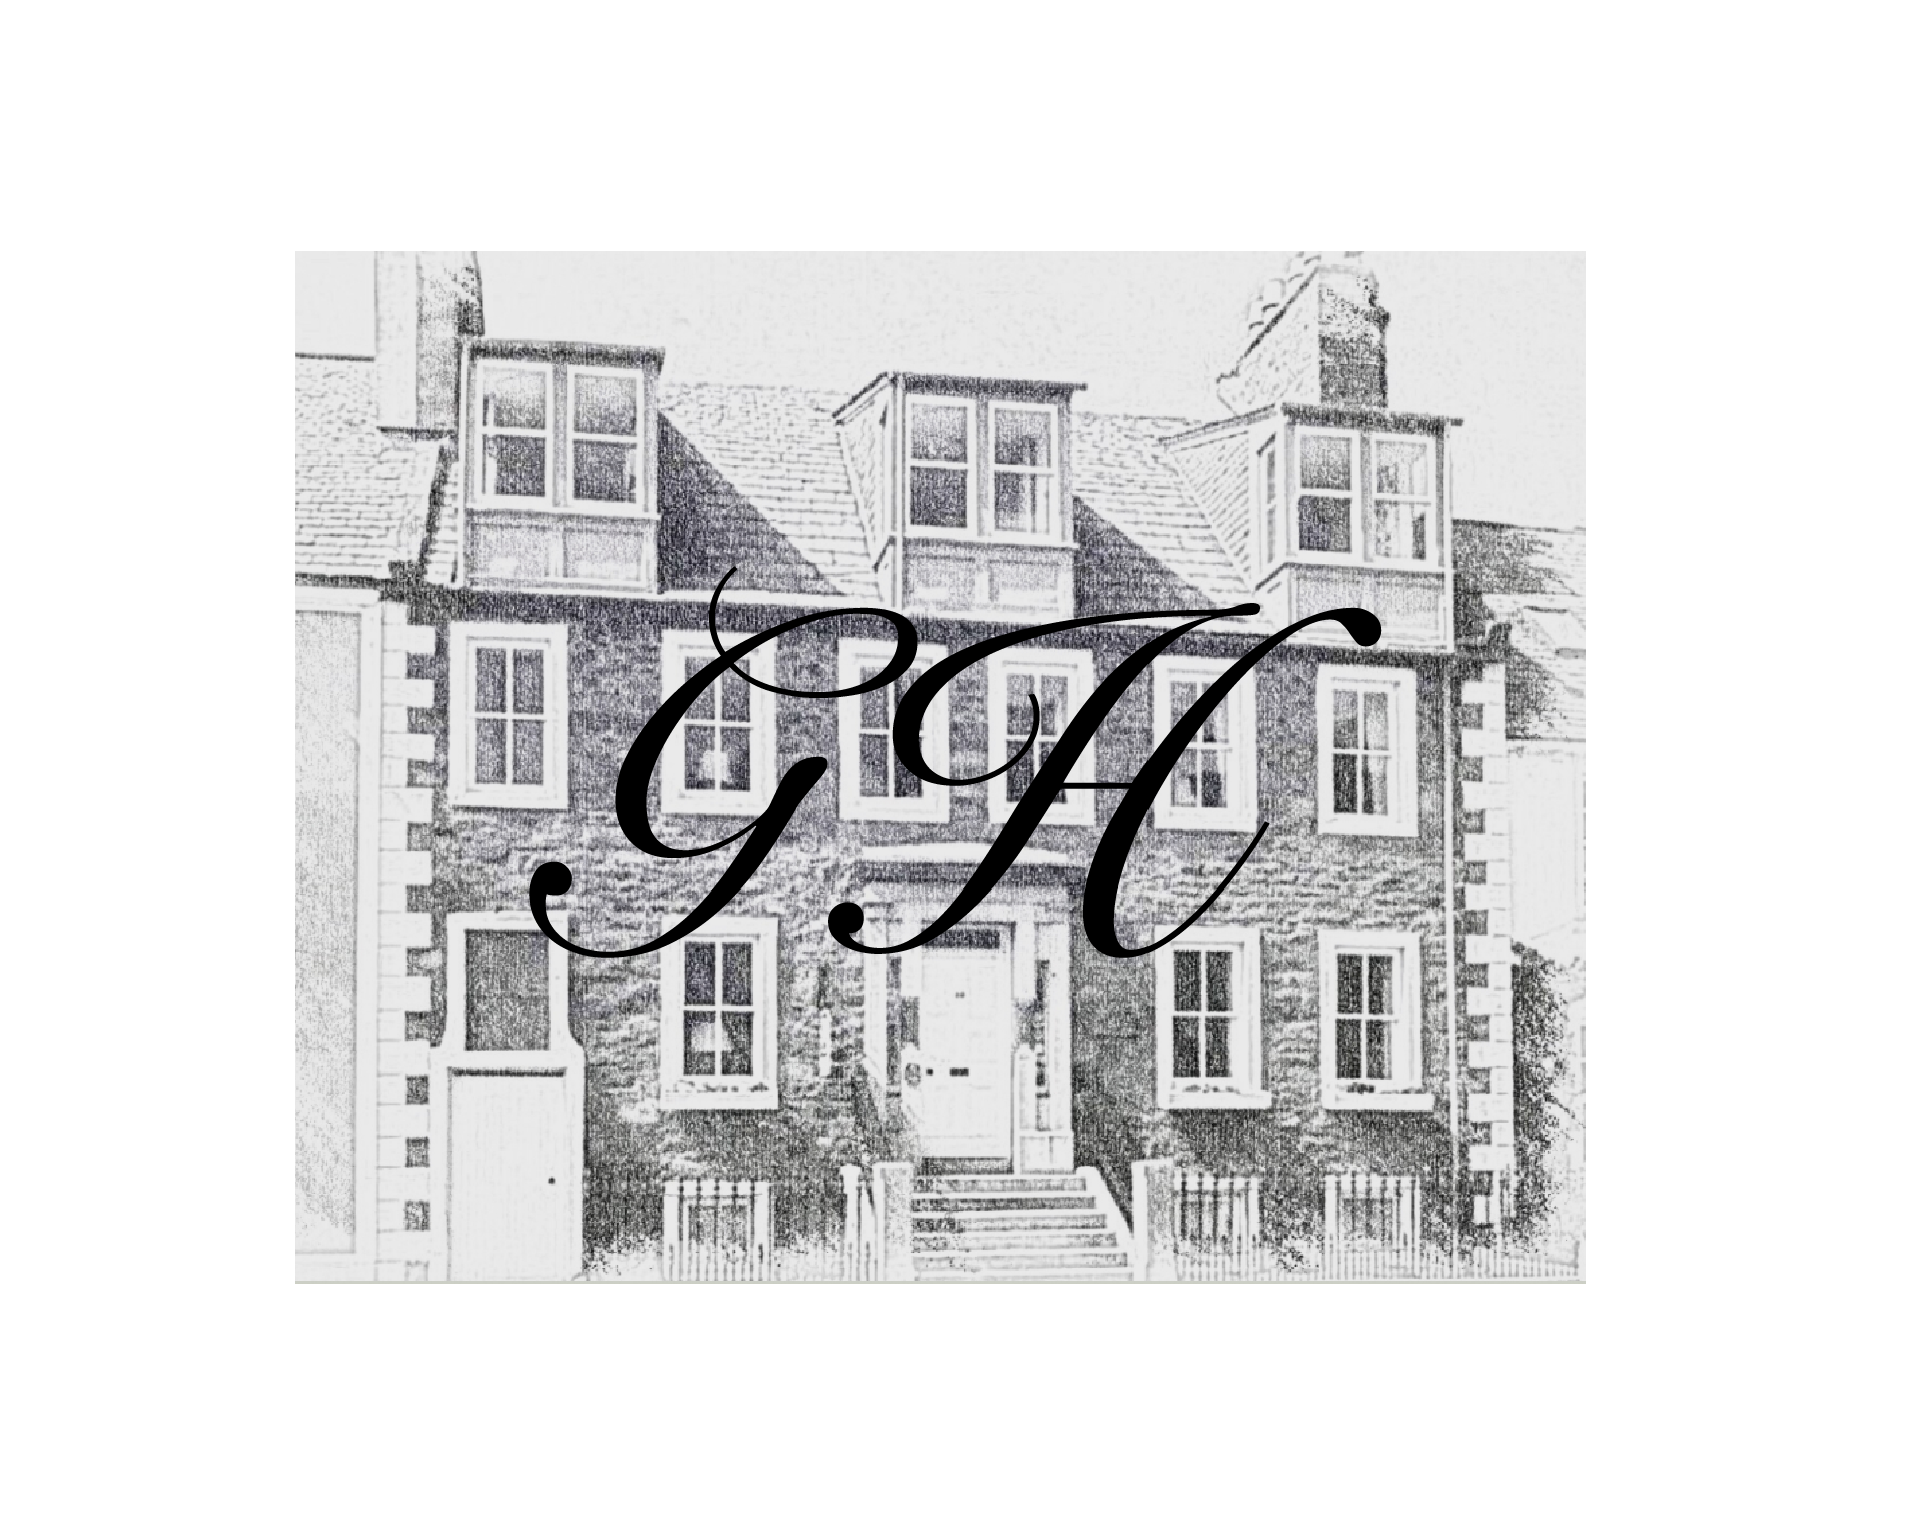 Gladstone House